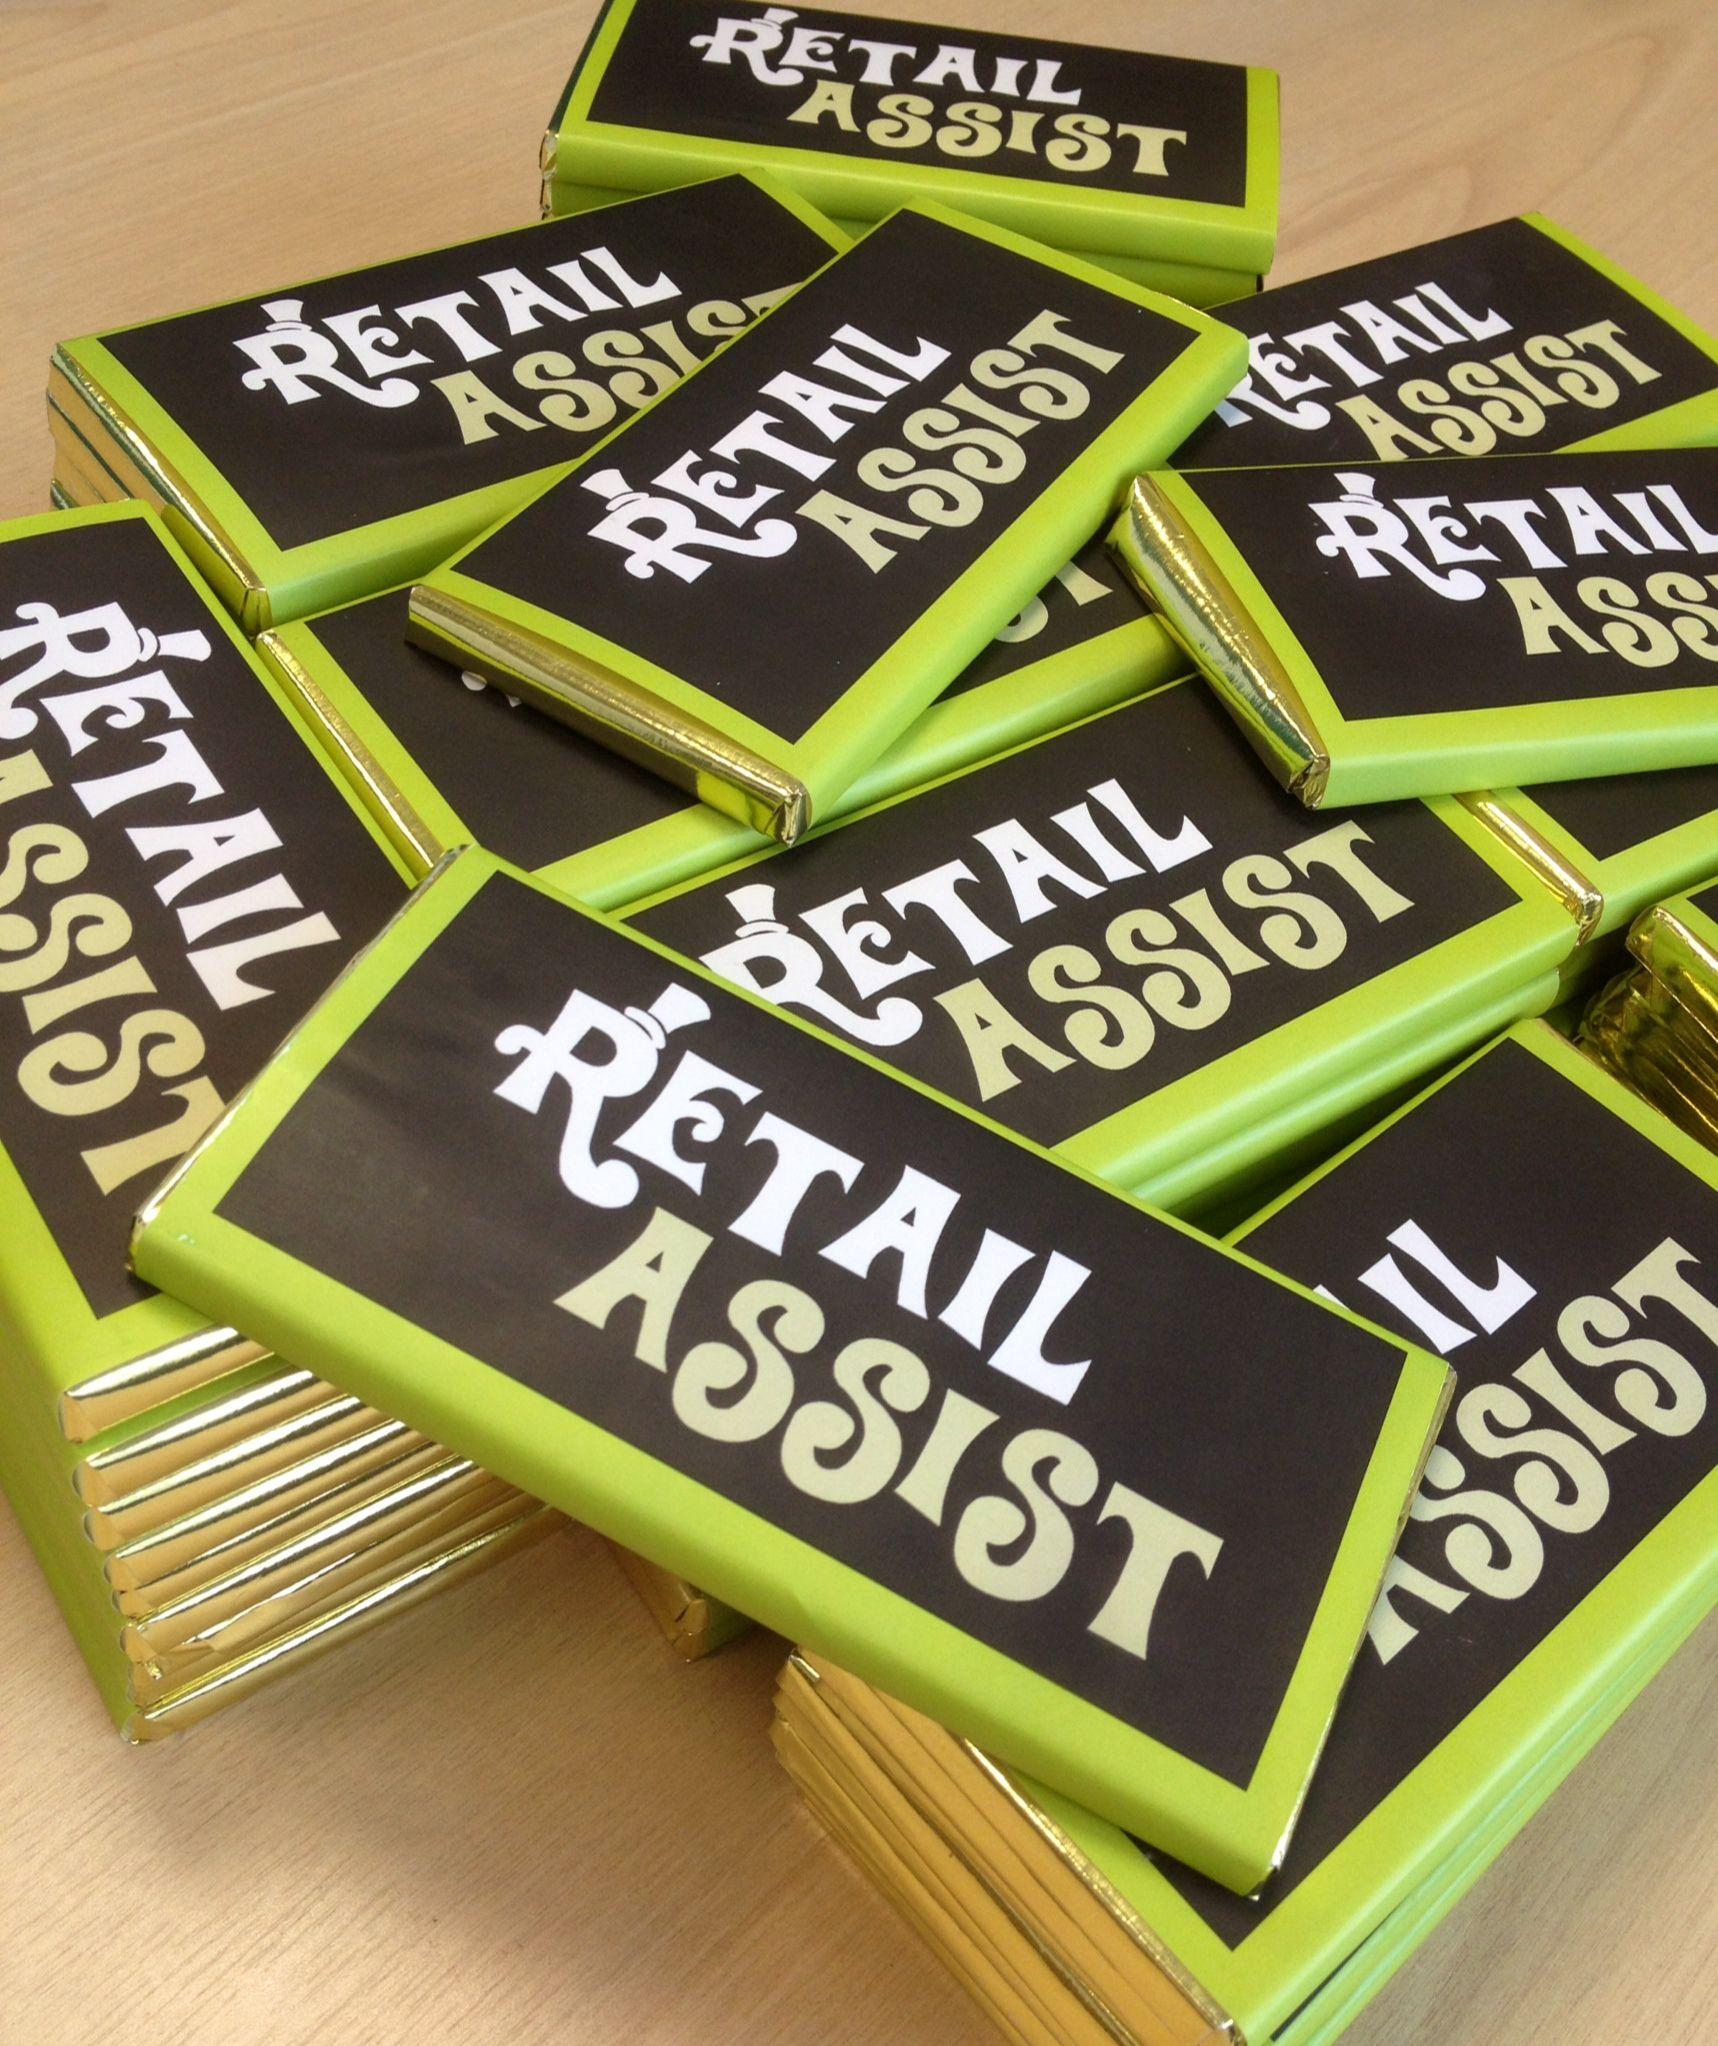 Retail Assist Golden Ticket